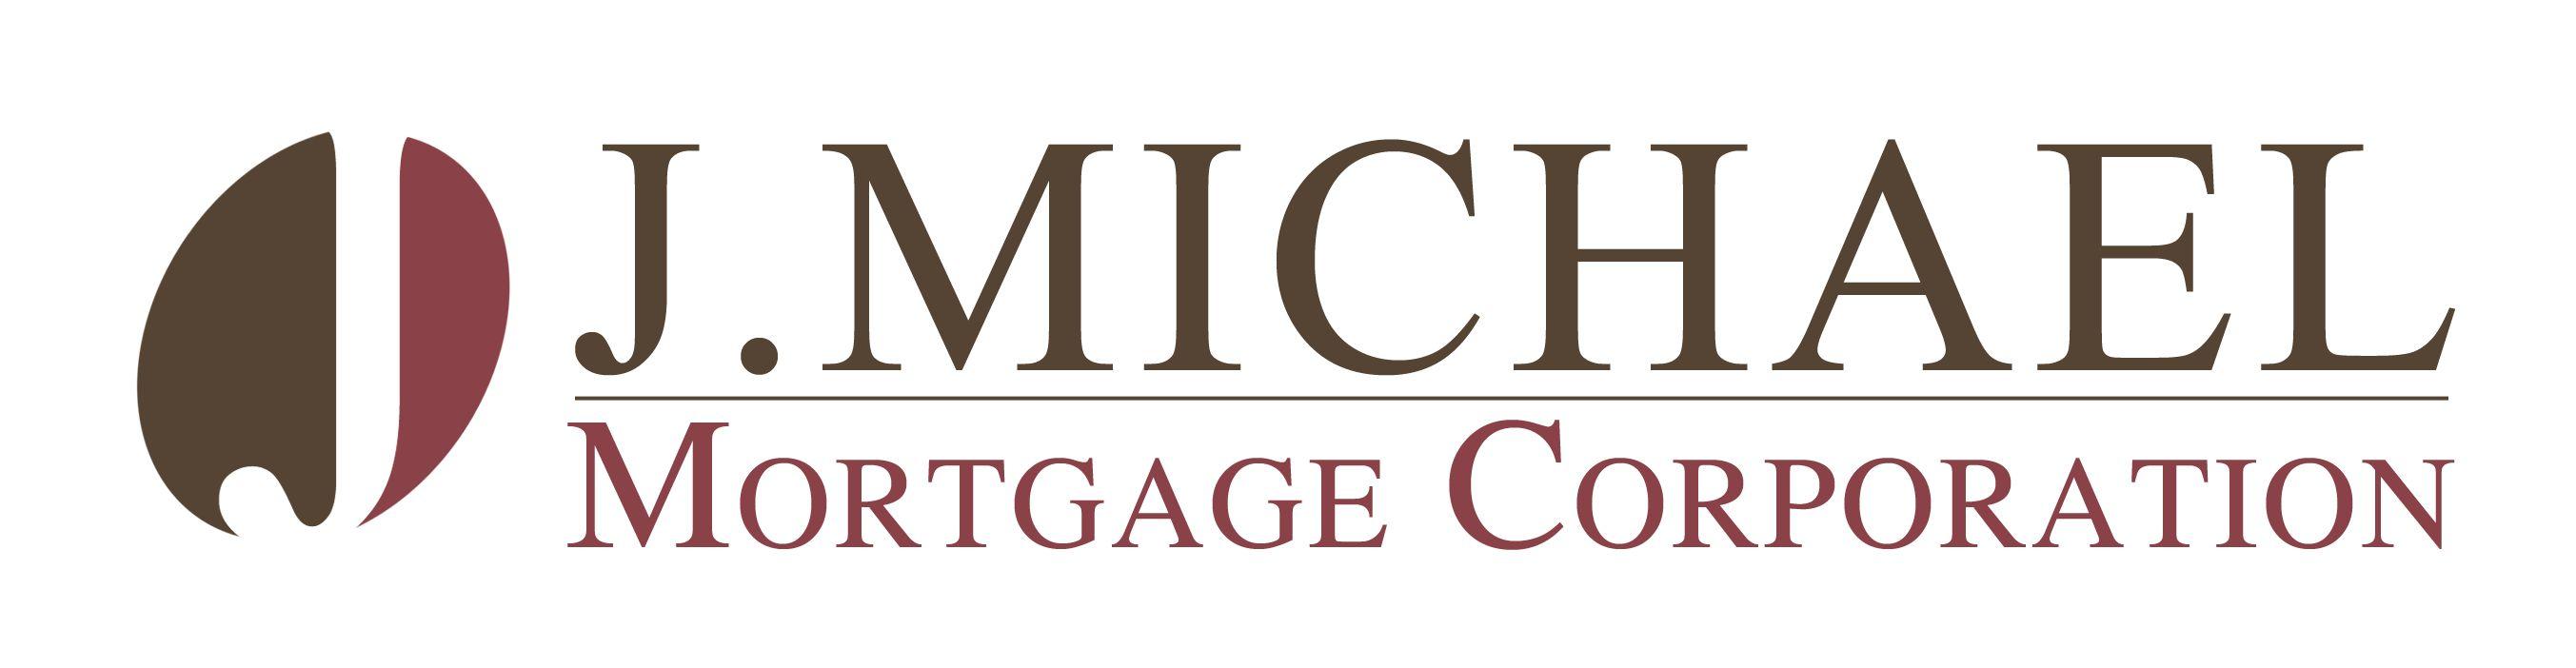 J.Michael Morgage